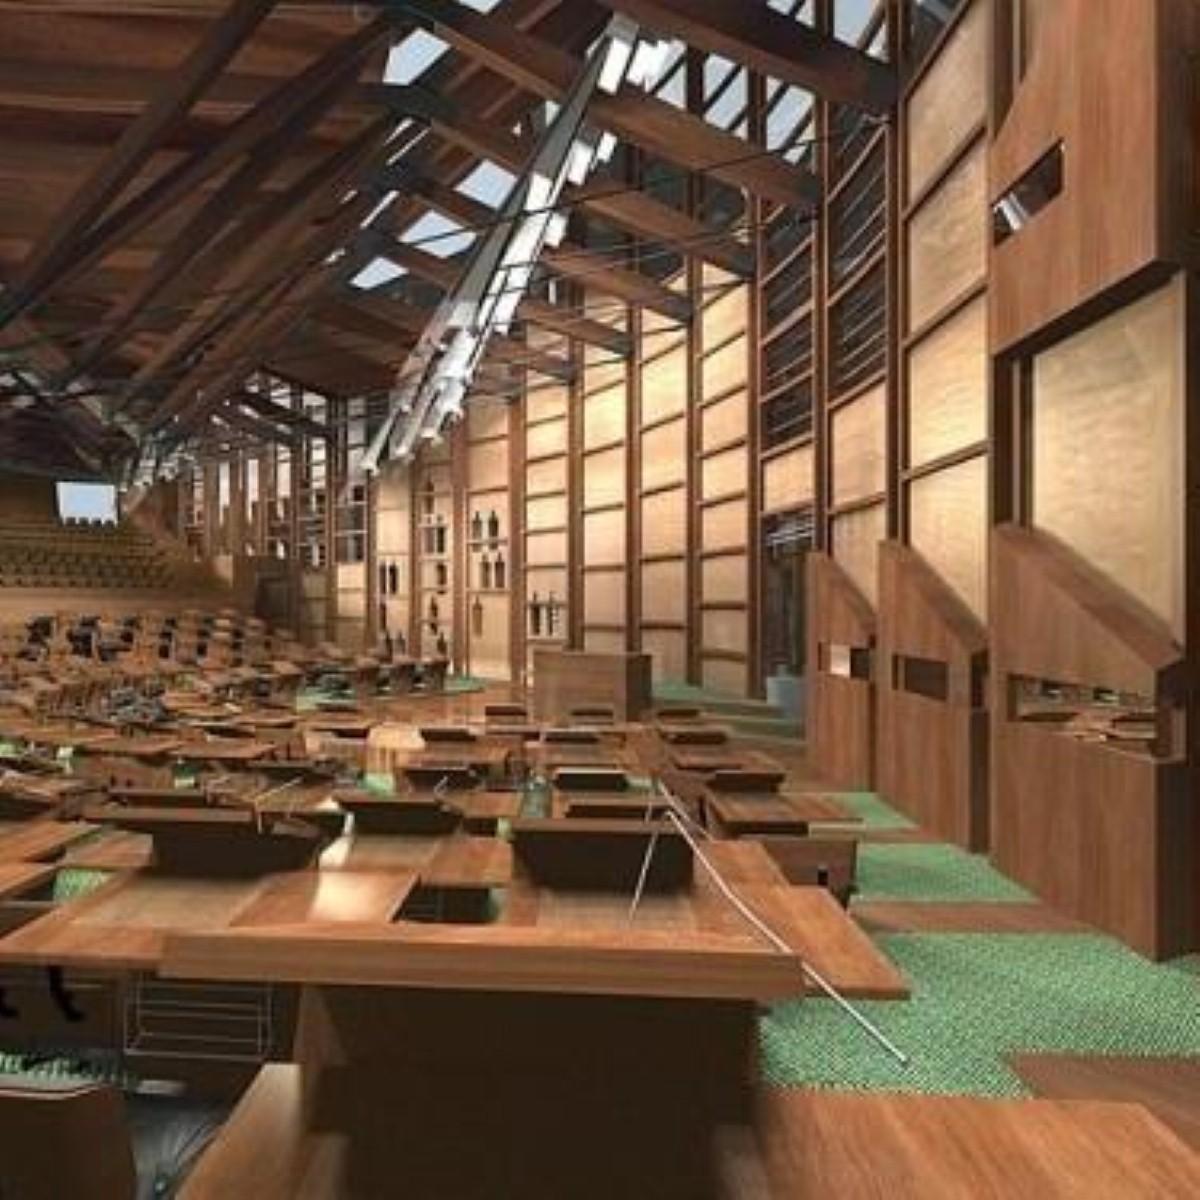 The Scottish parliament debating chamber